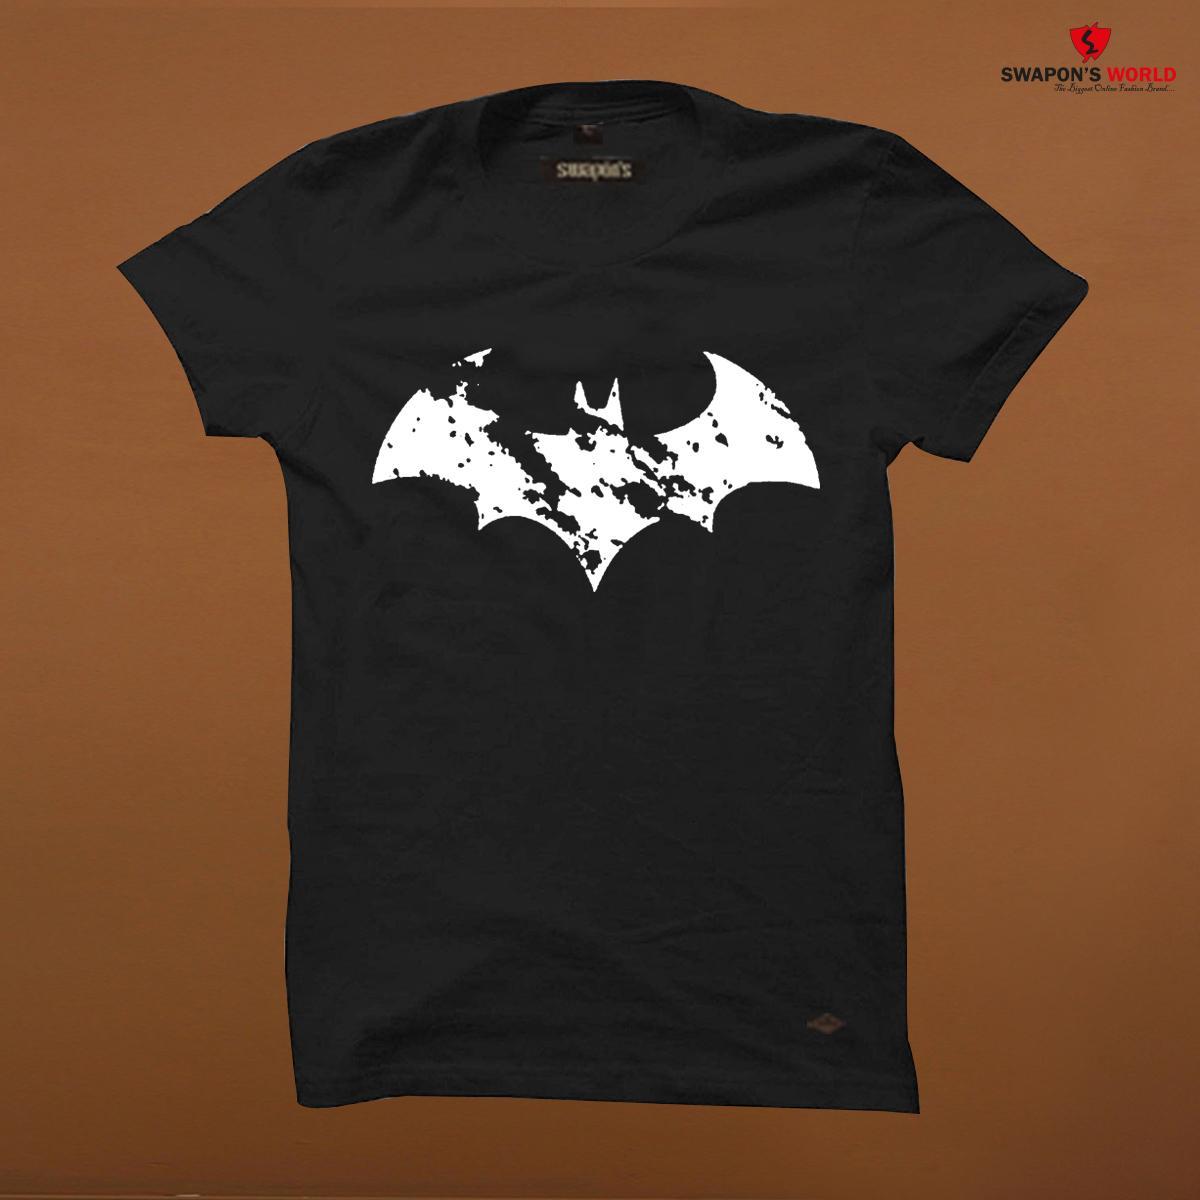 new arrival 3c86a 89dfb Black Cotton Half Sleeve T-Shirt for Men Code-SW3795T